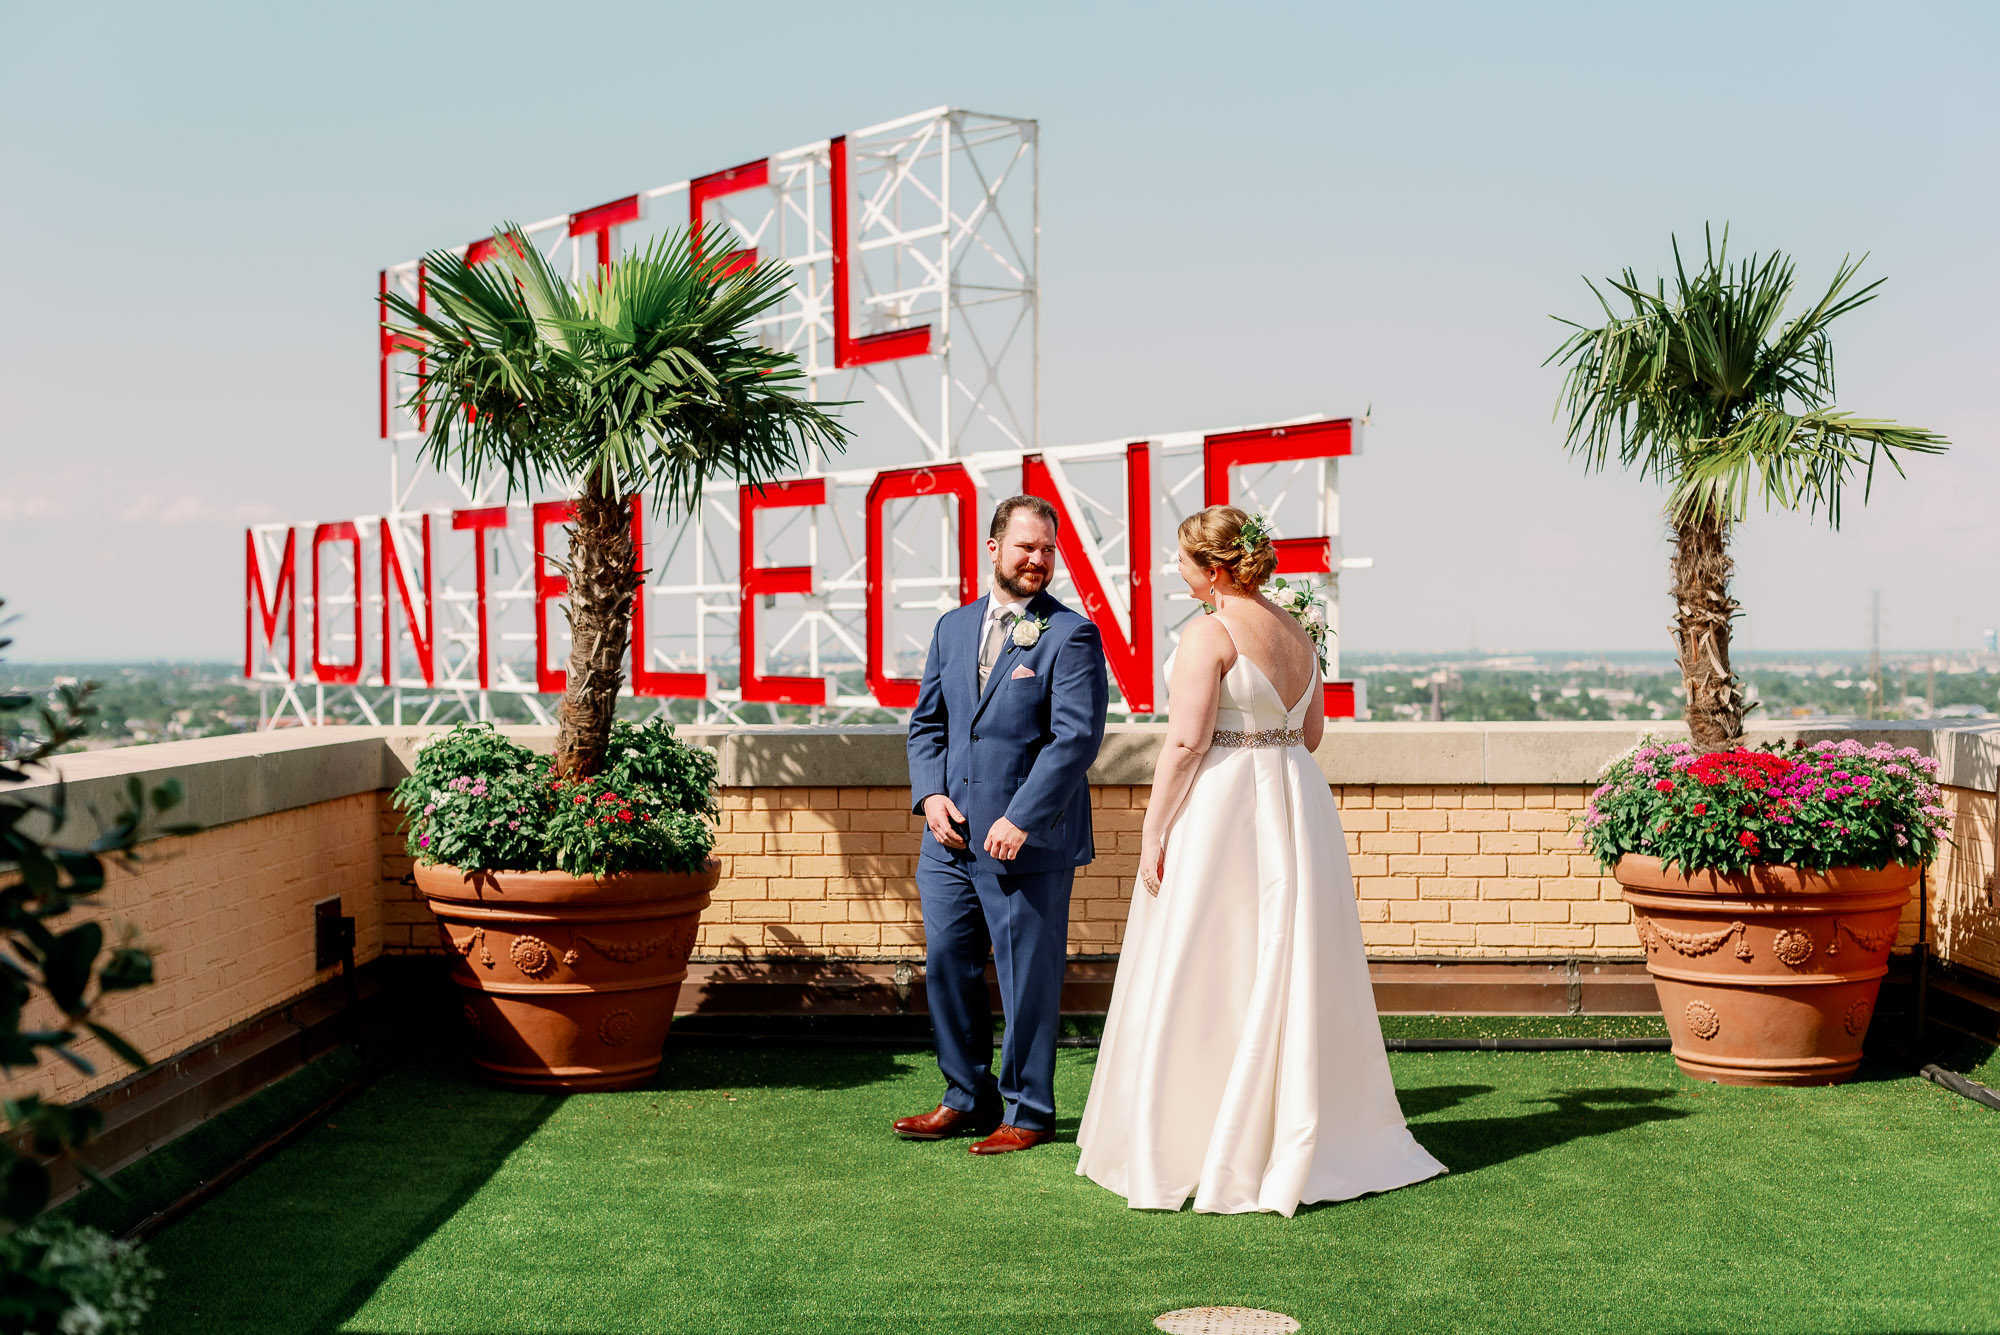 Marche New Orleans Wedding Venue Photographer (12).jpg